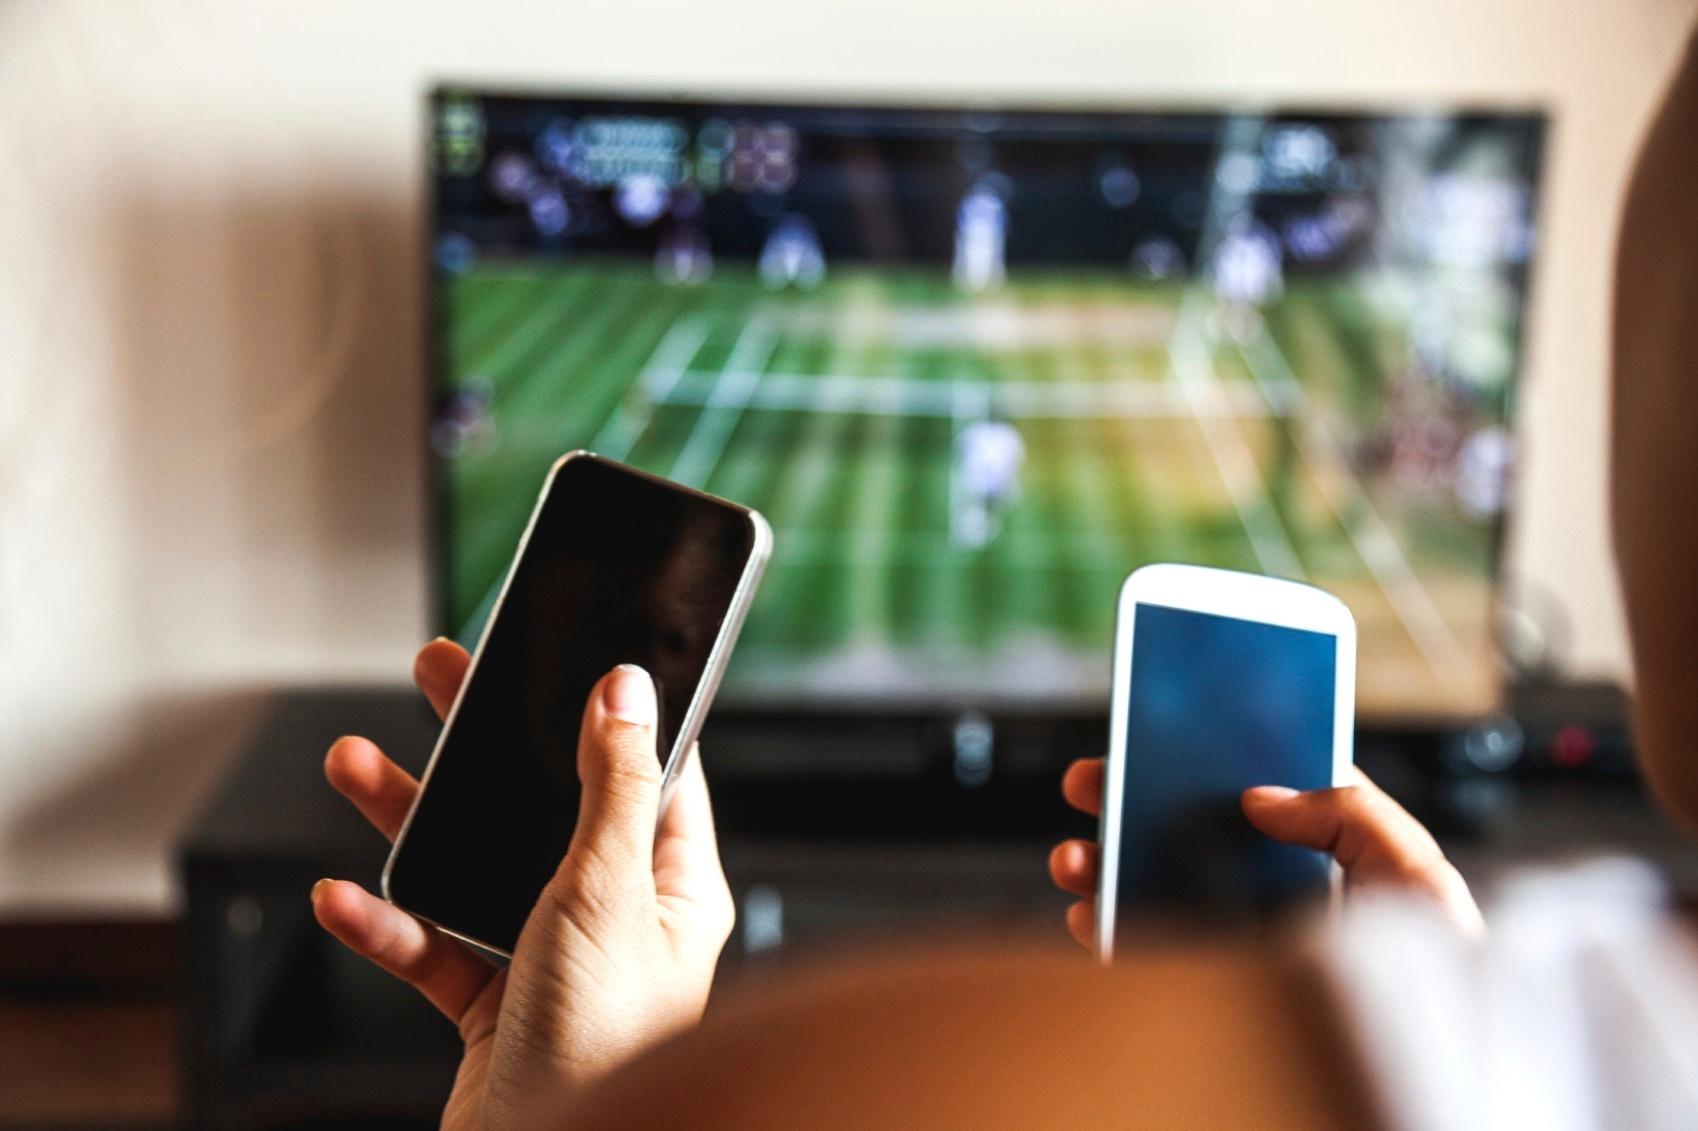 180_4_Treat_Alternative_Healing-ADD_SS_180_Using-Phones-Watching-TV.jpg